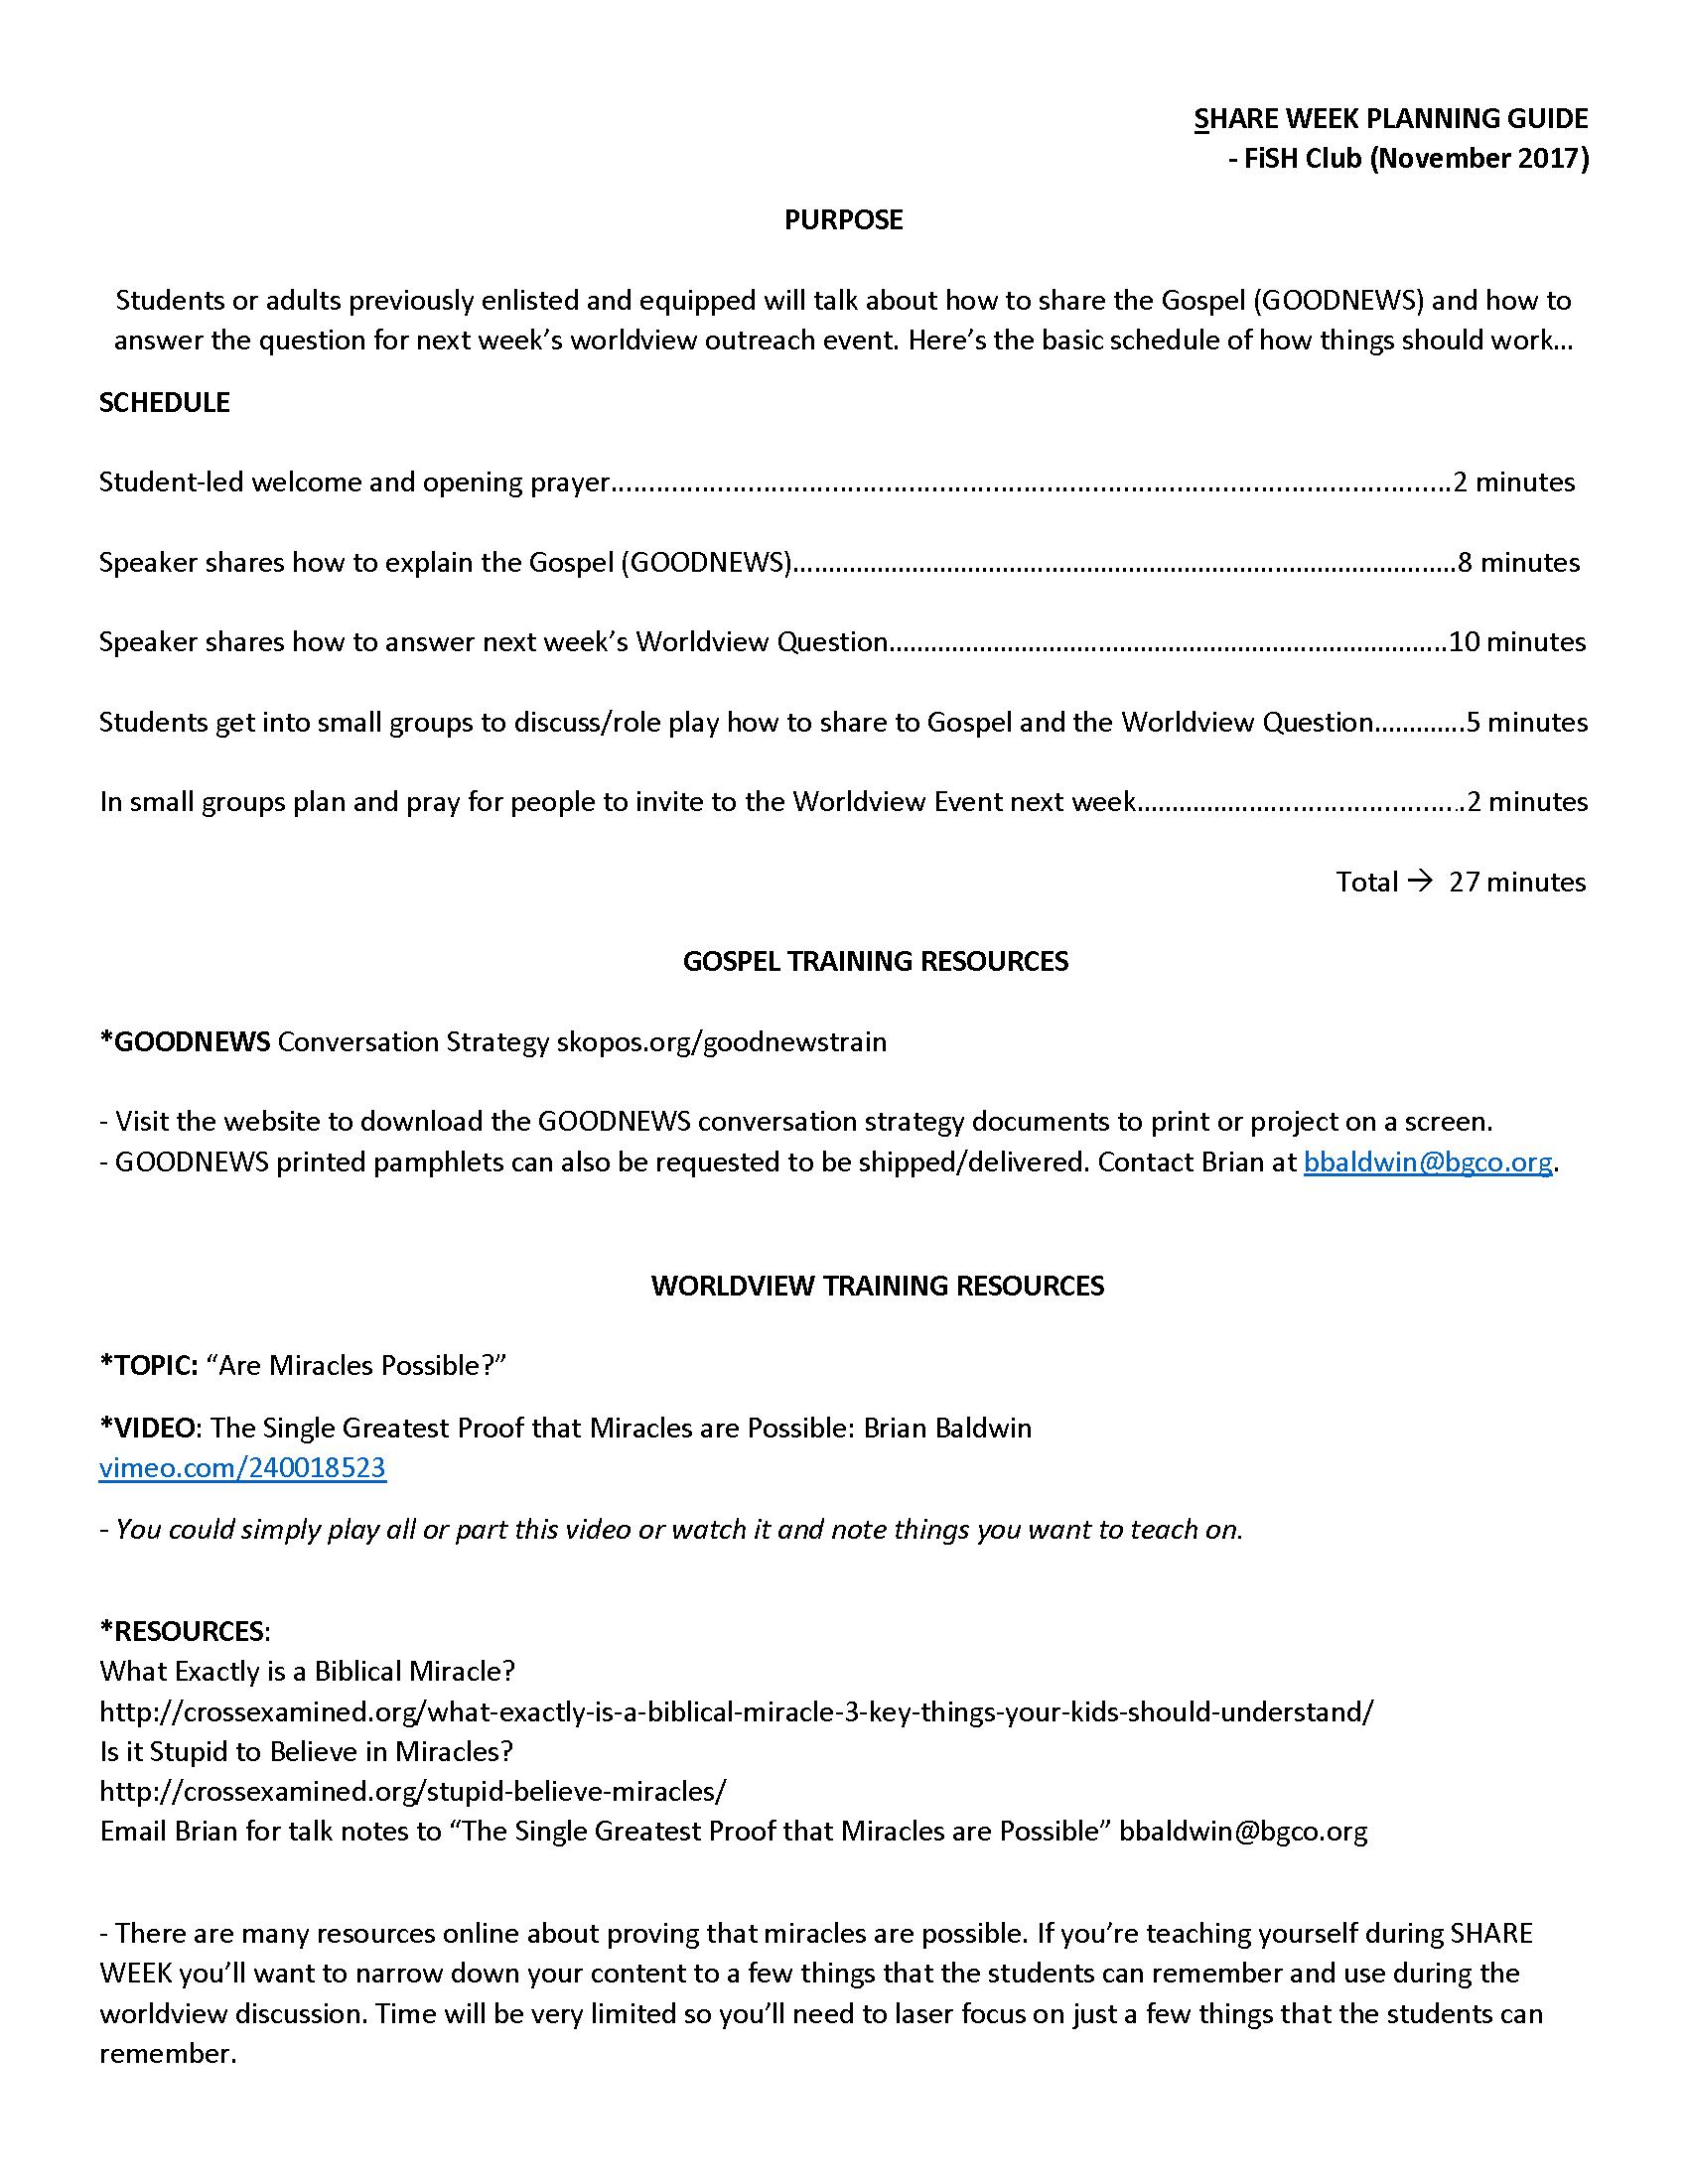 Share Week Planning Guide (November)